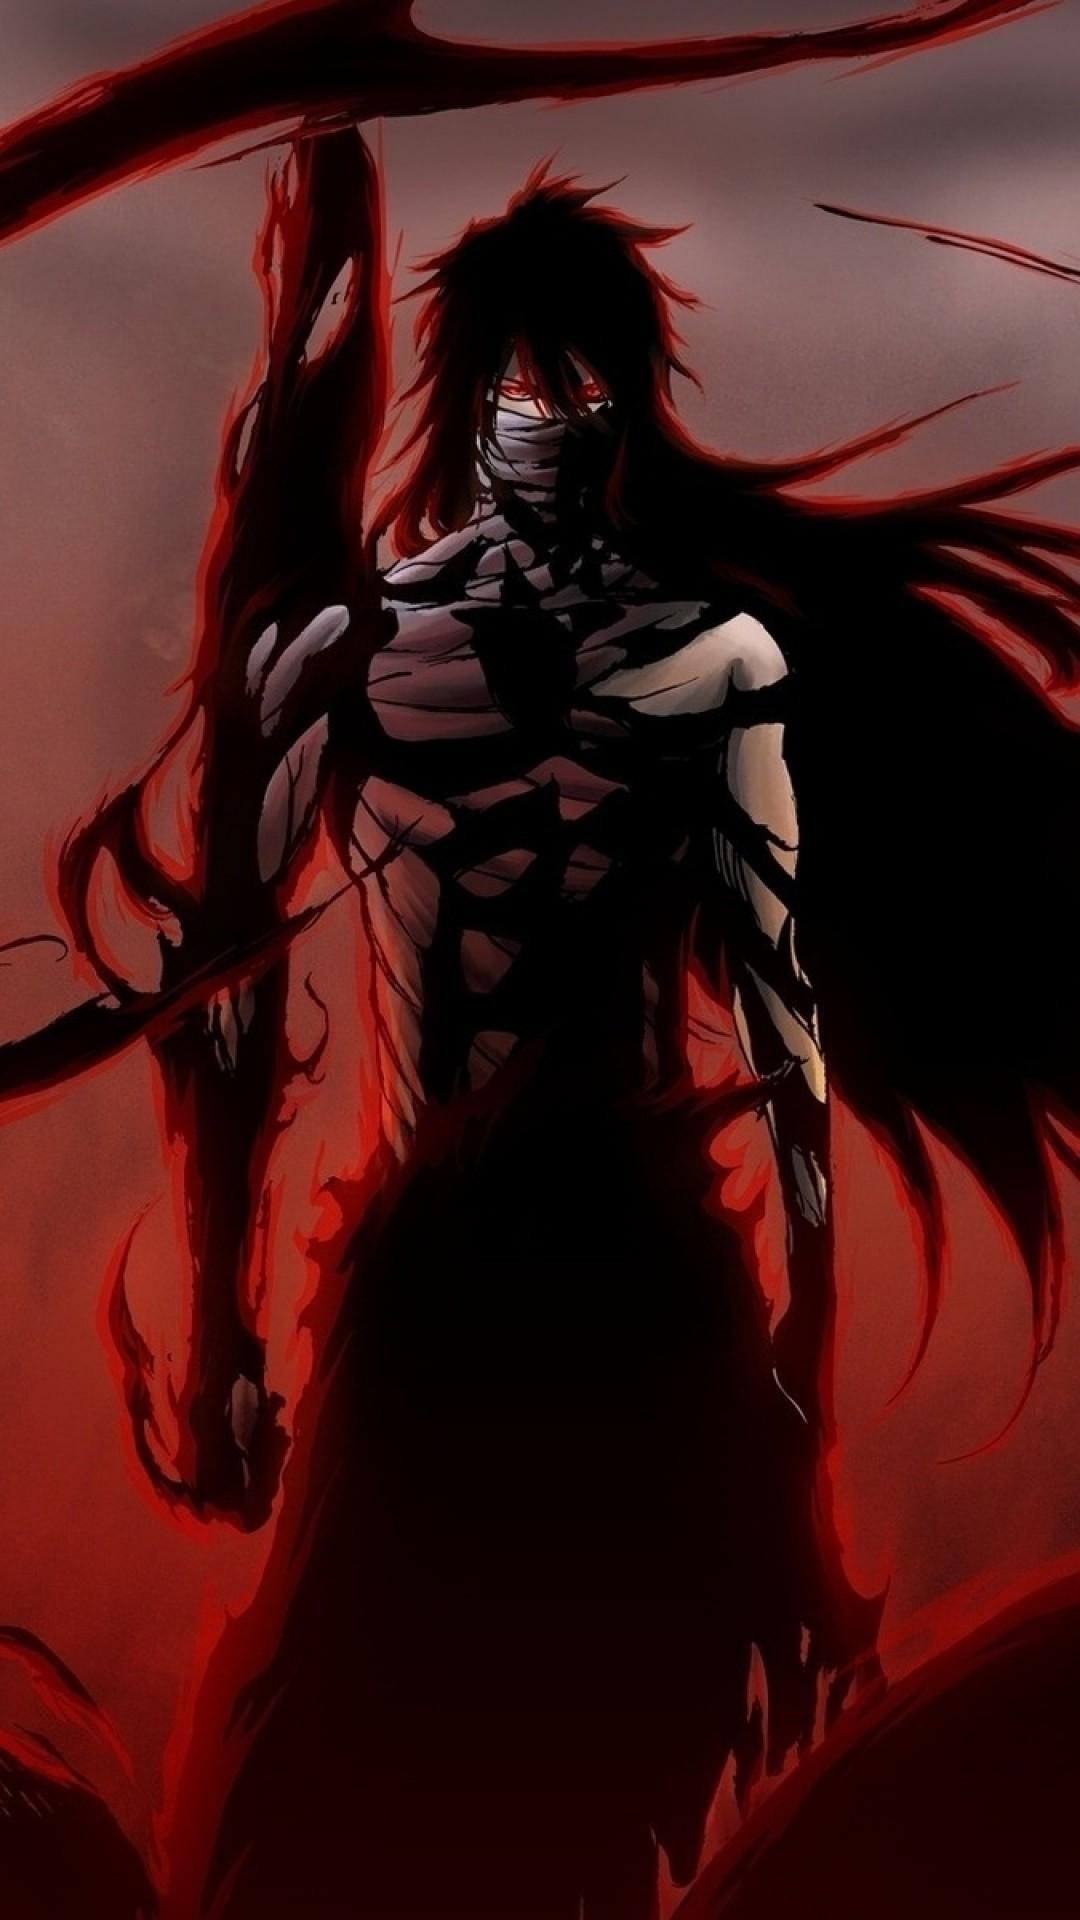 Ecchi Anime Demon Girl Wallpaper Android Anime Wallpaper 1080x1920 84 Images